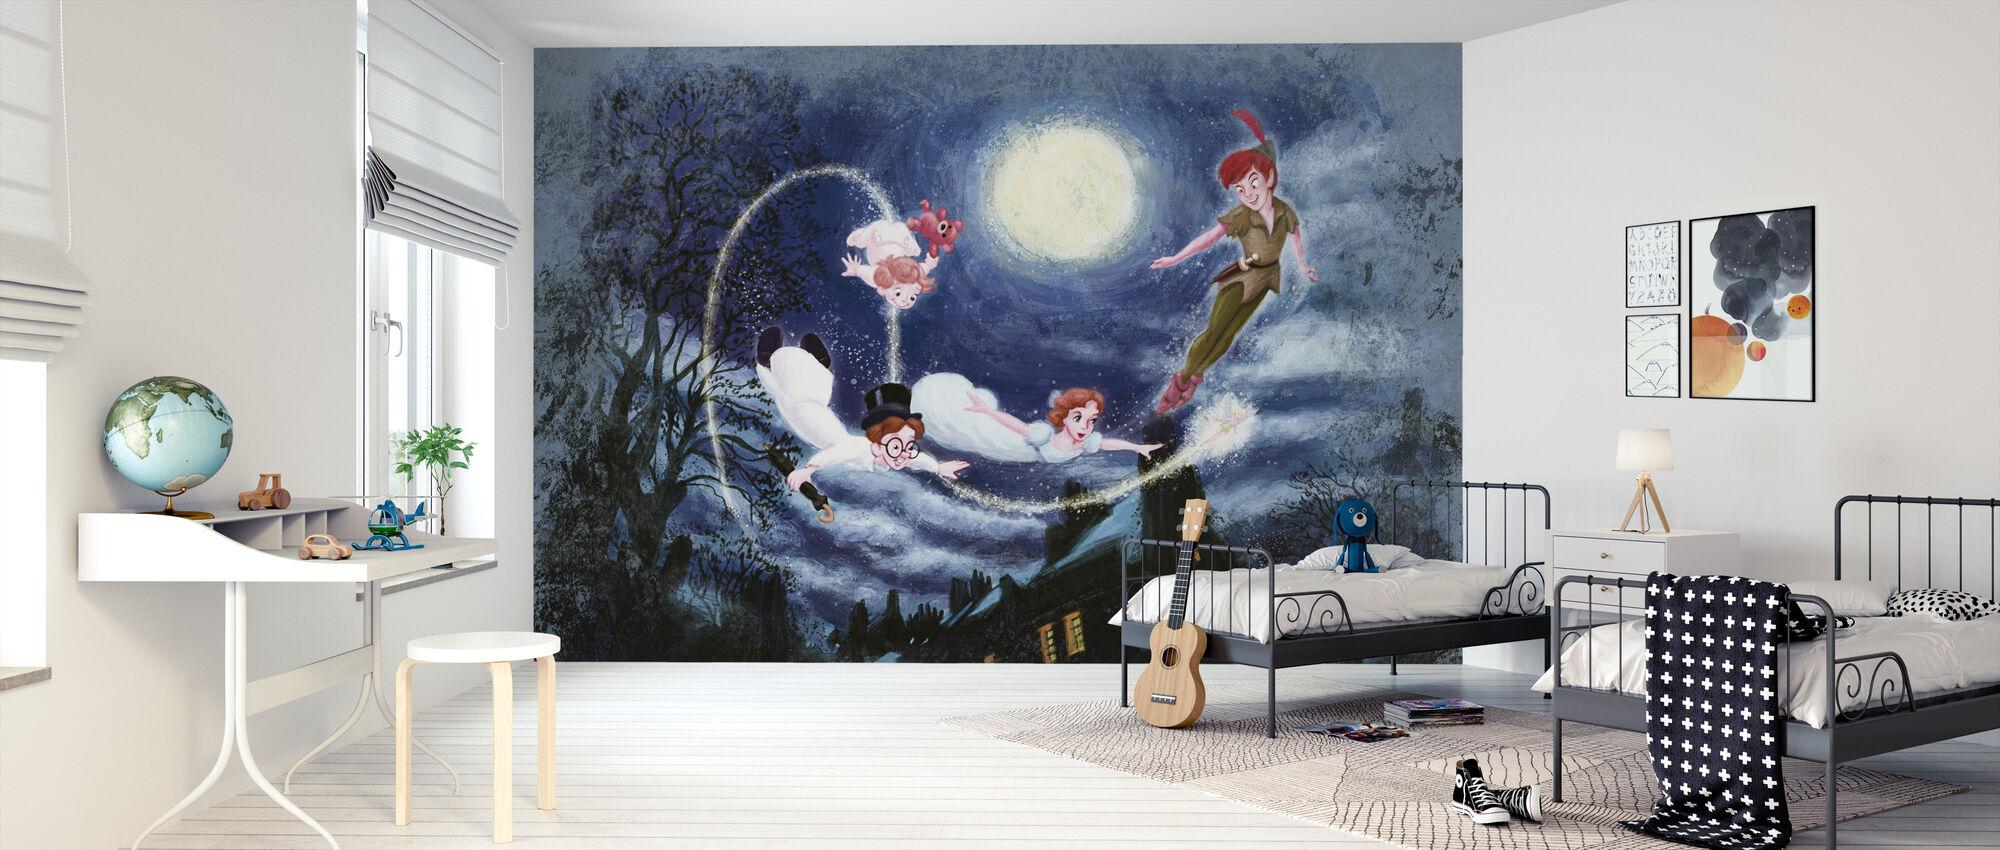 Disney Classics - Peter Pan - Tapet - Barnrum